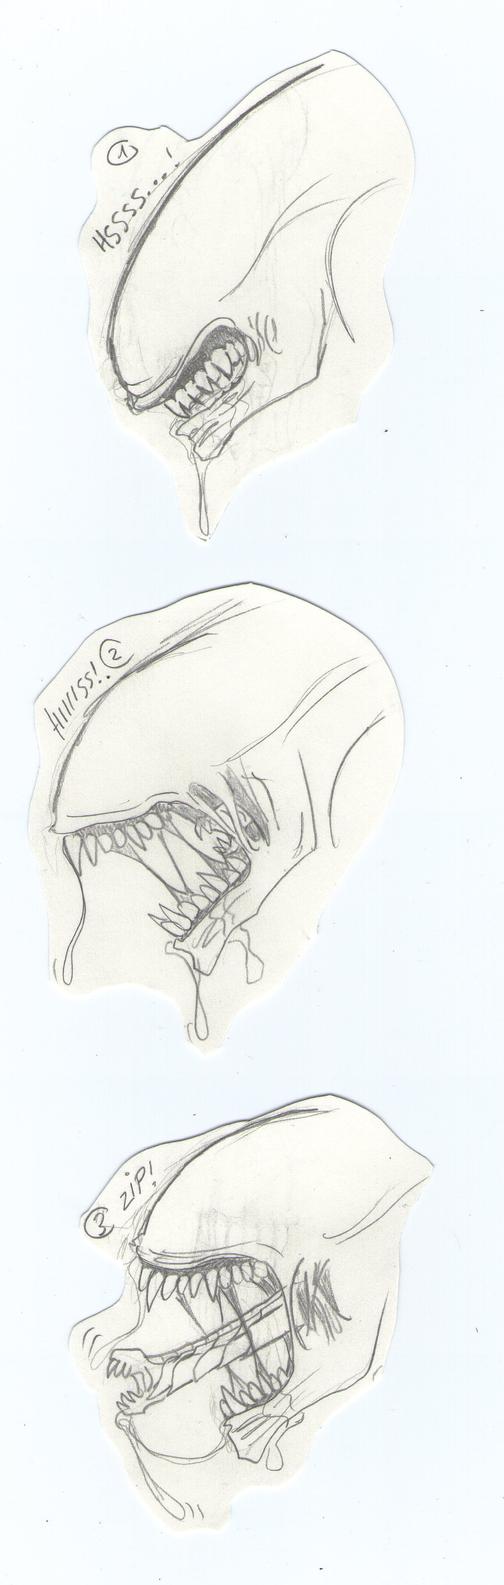 Mis dibujos, espero que os gusten - Página 3 Three_steps_to_death____by_sweetyxenomorph-d4sjs8a